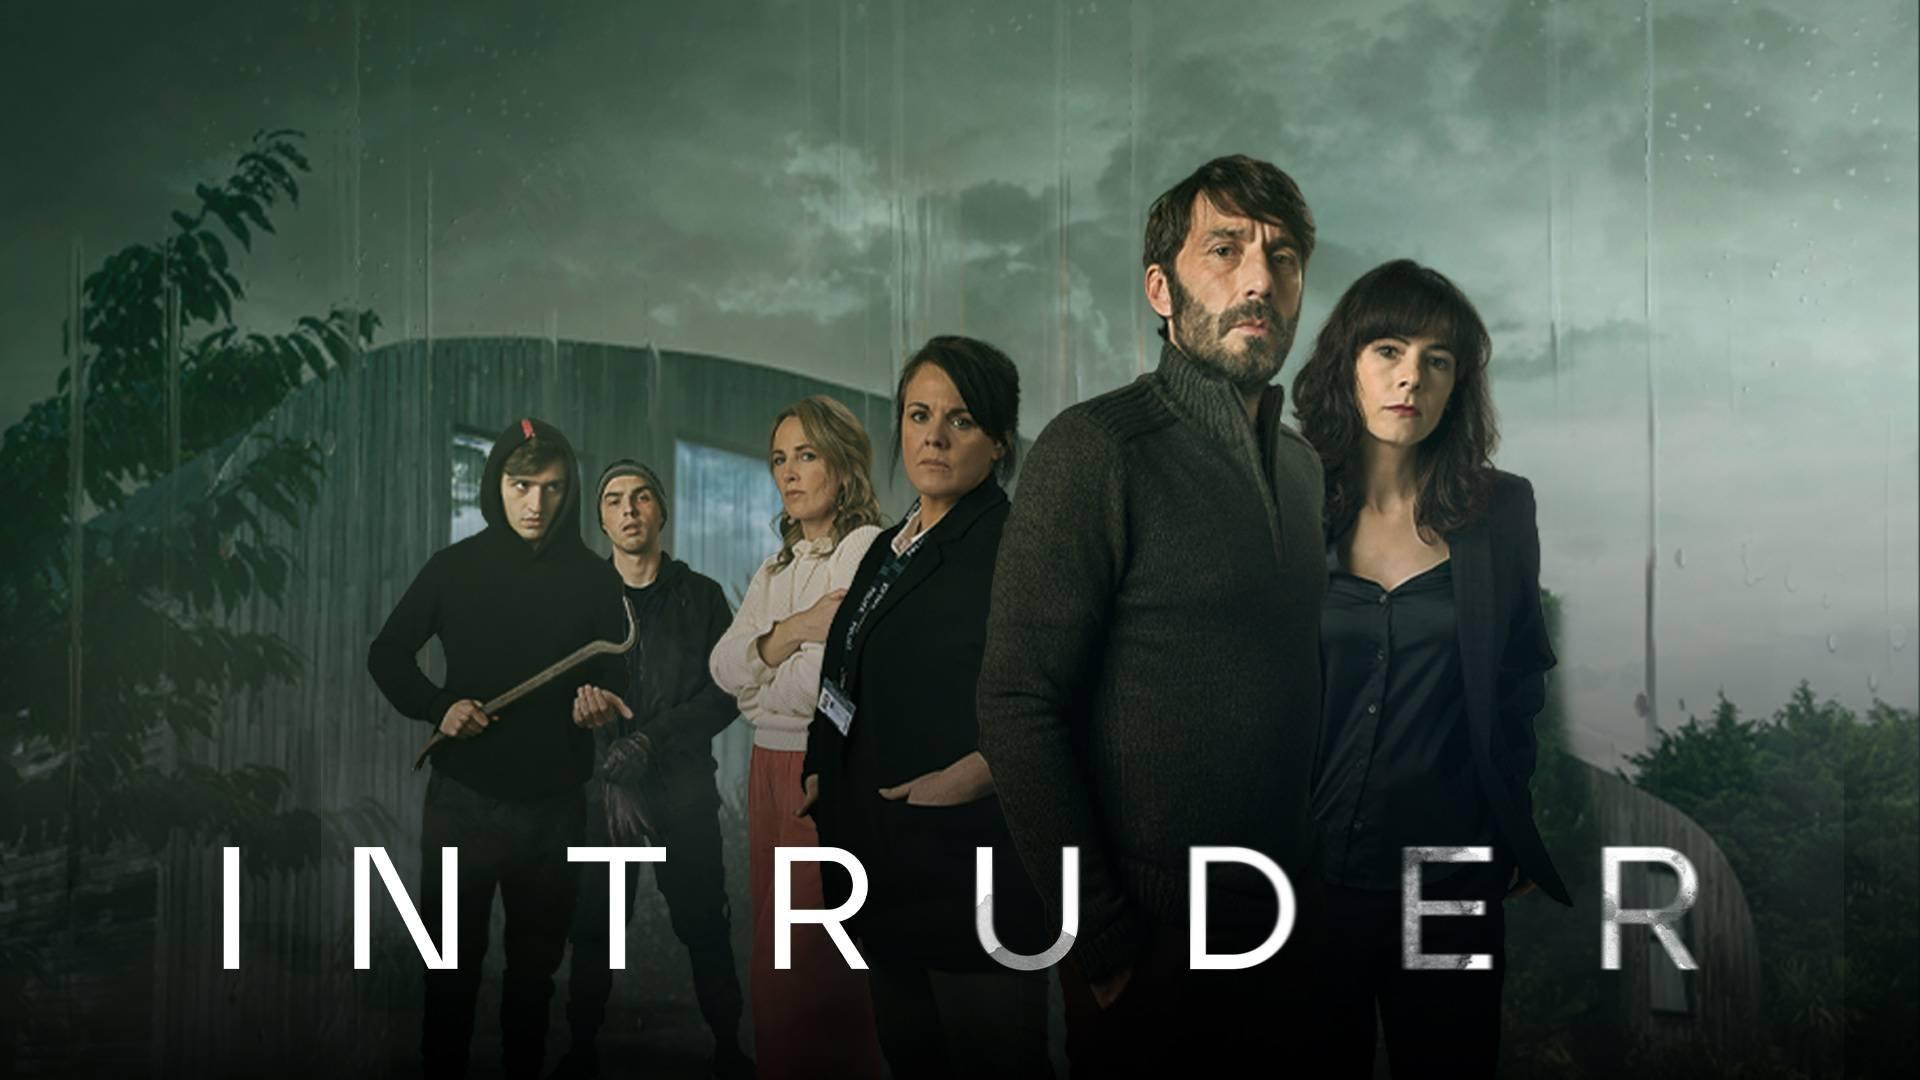 Intruder on BritBox UK